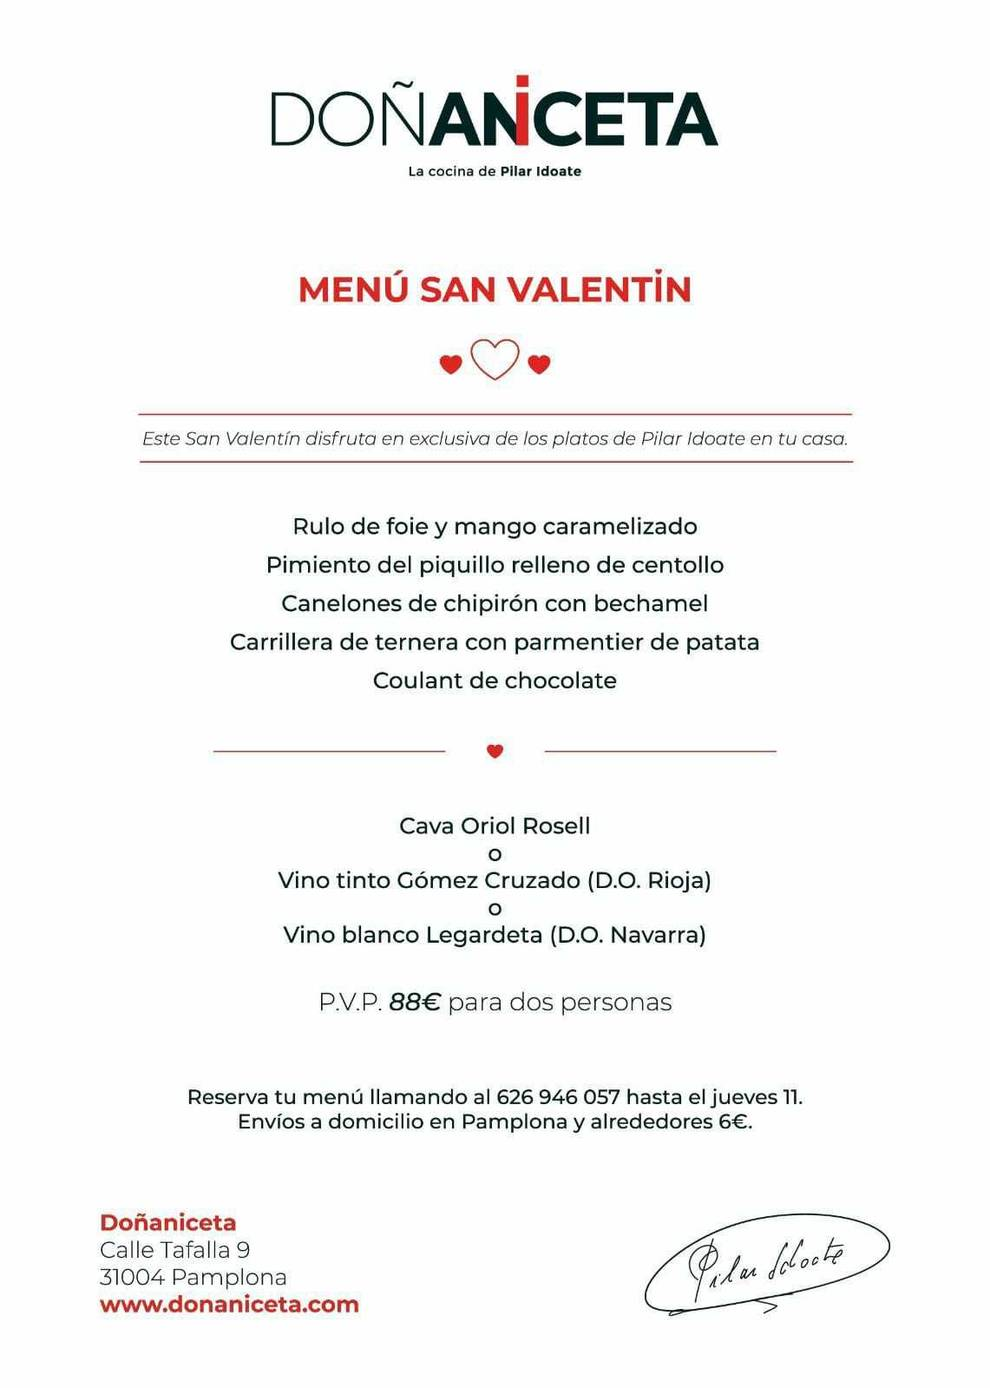 Imagen del menú de San Valentín de Doña Aniceta